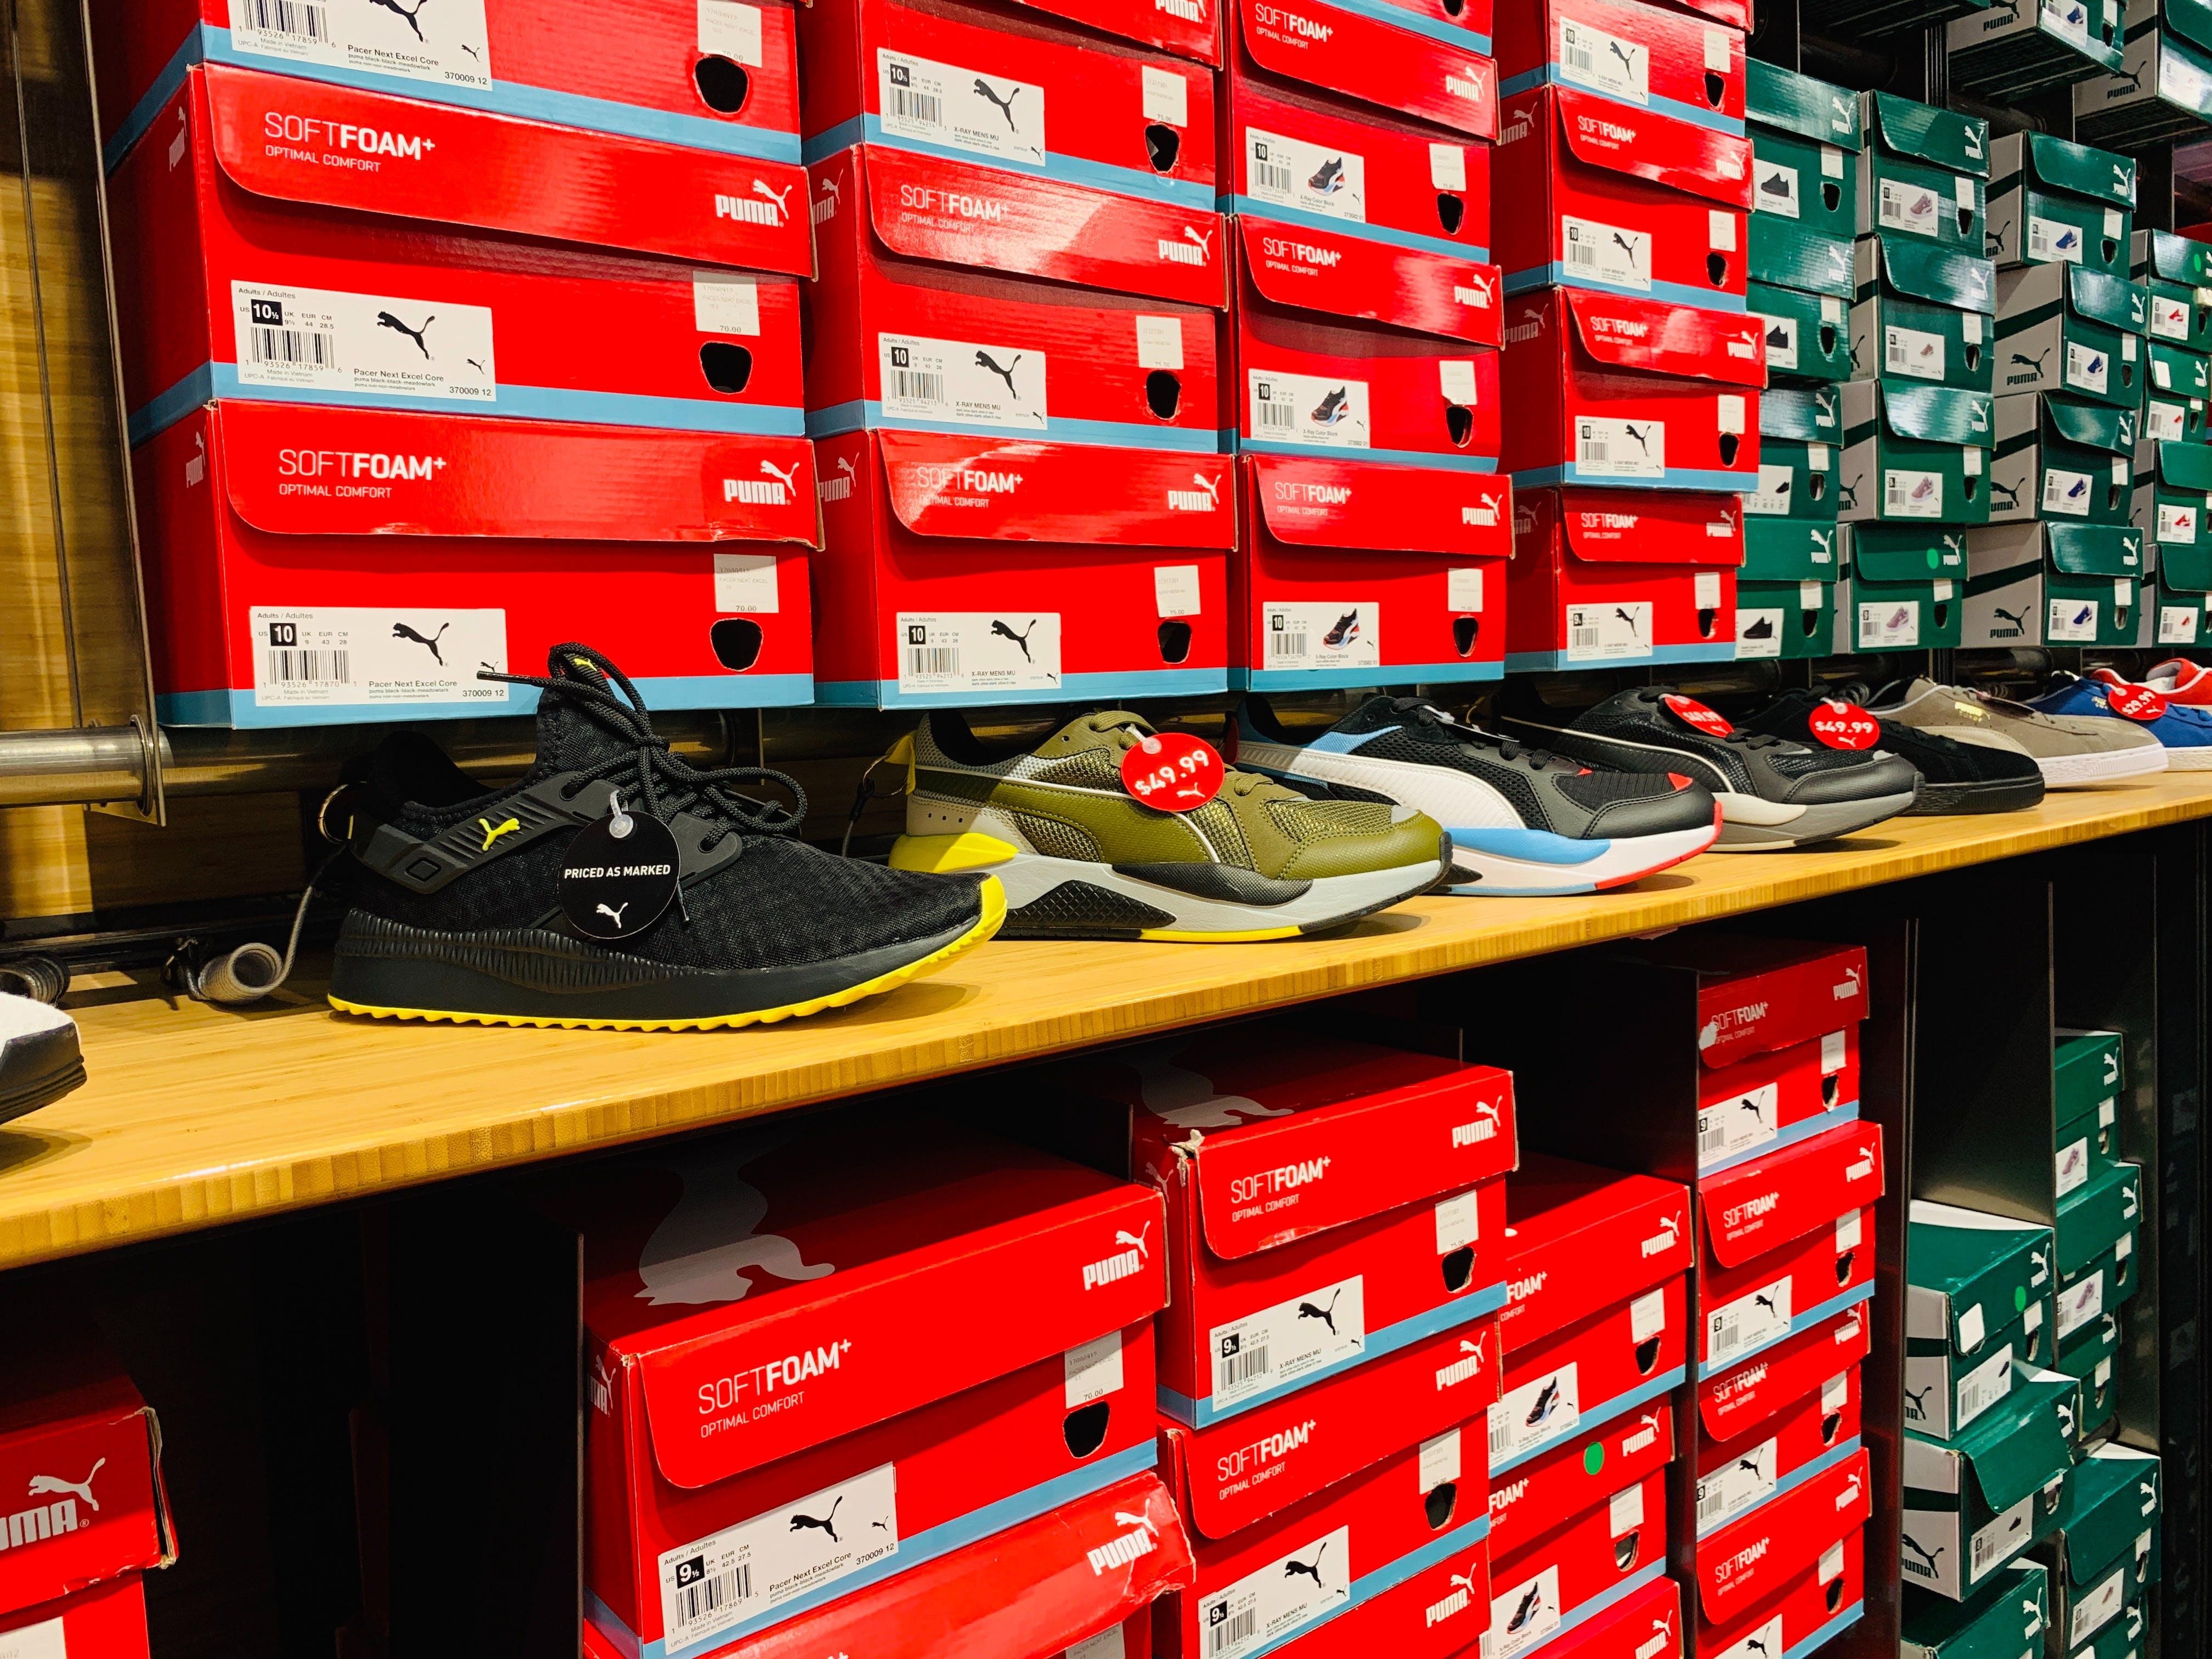 50% Off: Puma Loungewear \u0026 Footwear, as